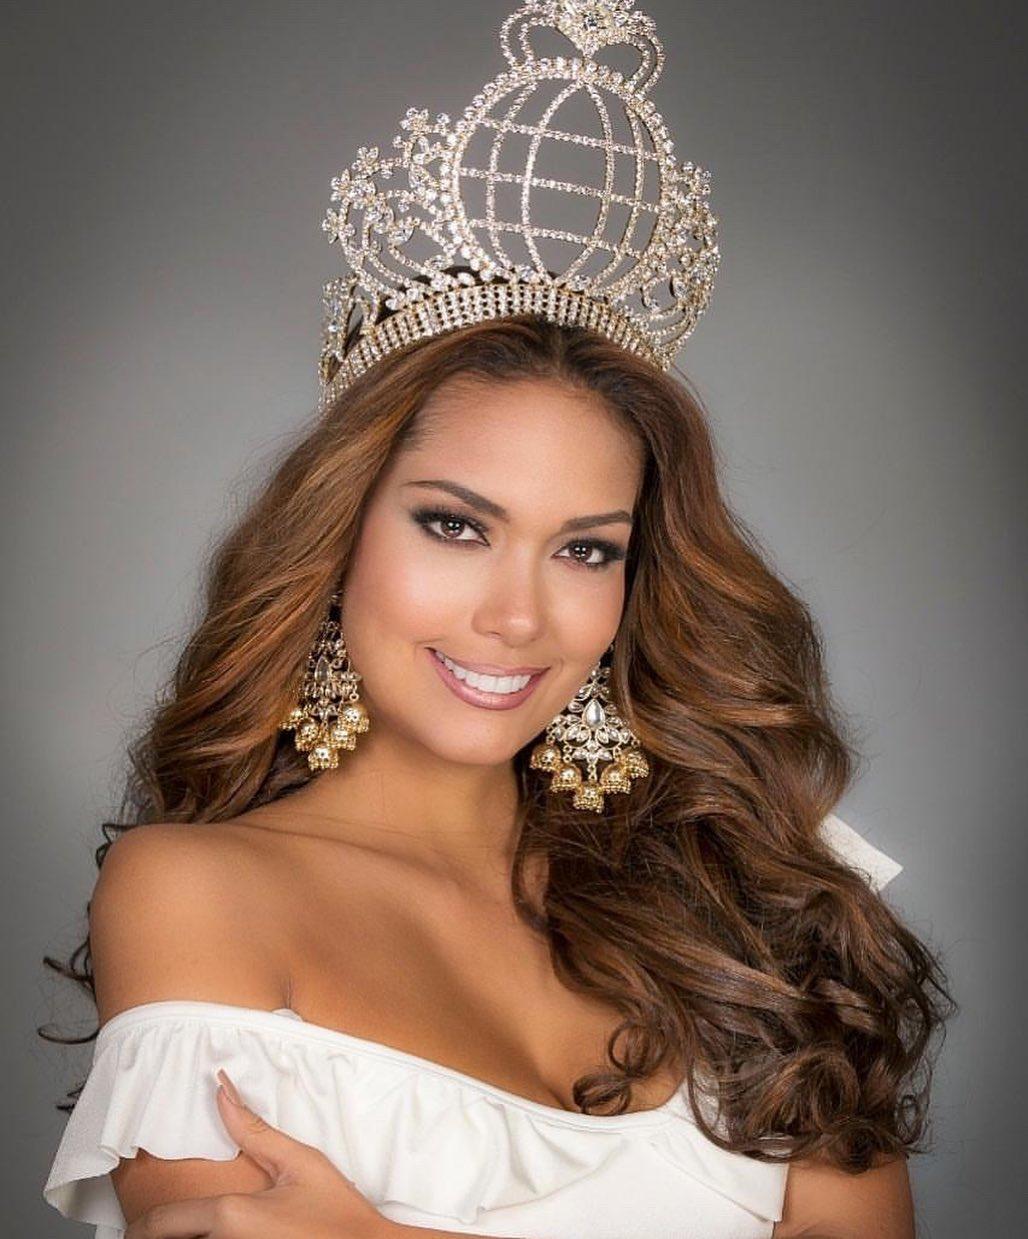 sara franco, miss colombia mundo 2019. 69767311